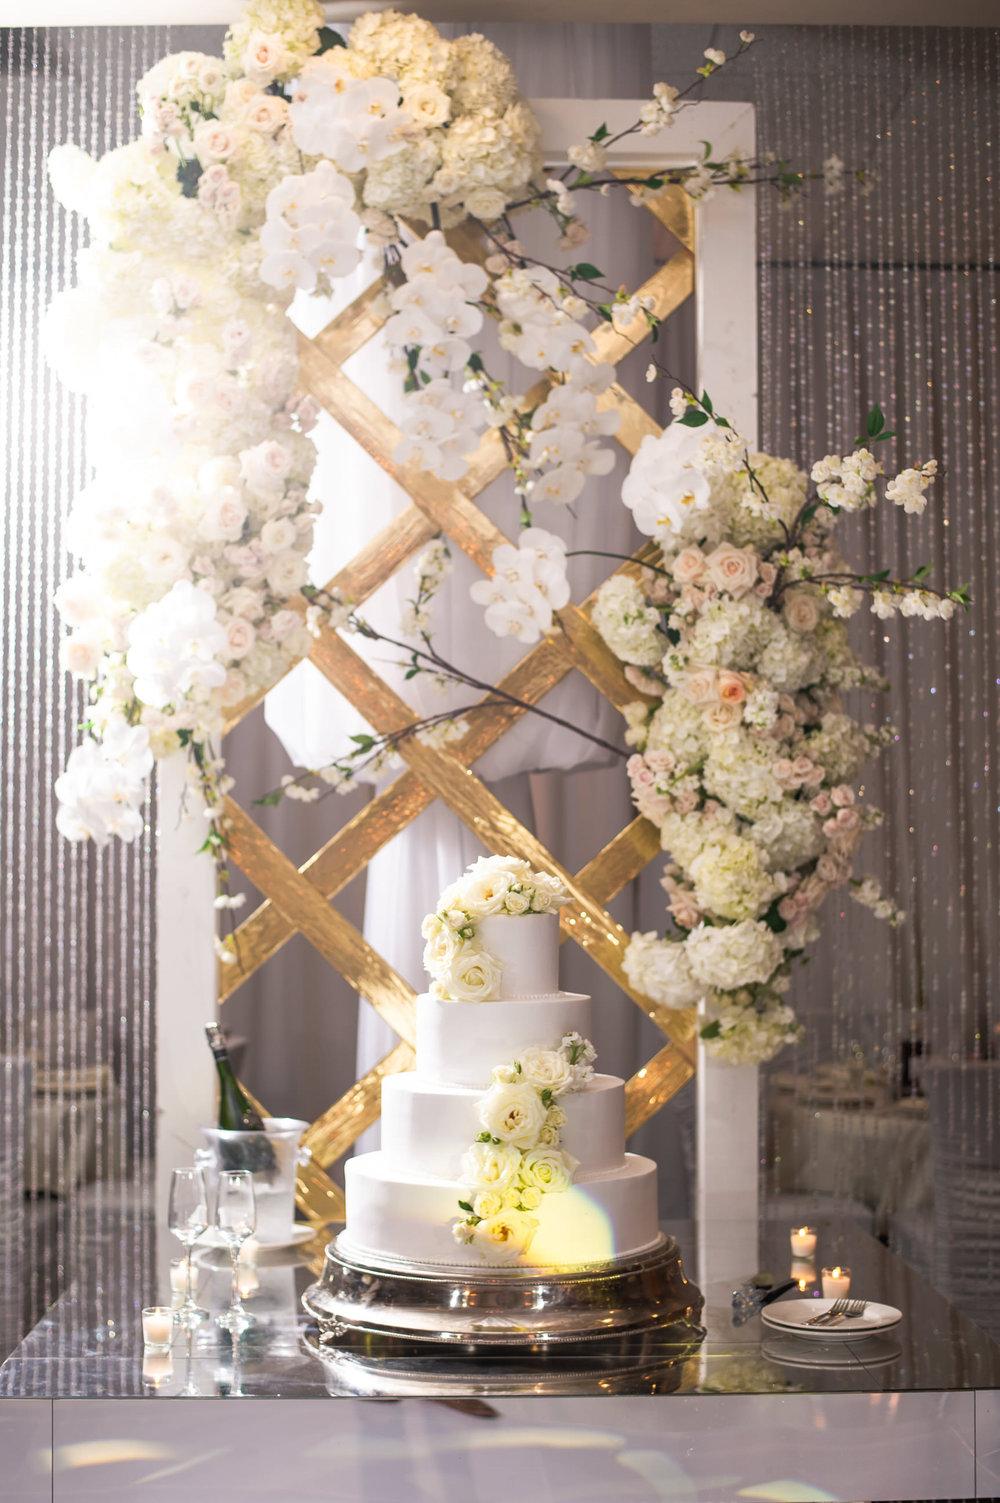 Dream_Wedding_Thanh_Thanh-20874.jpg